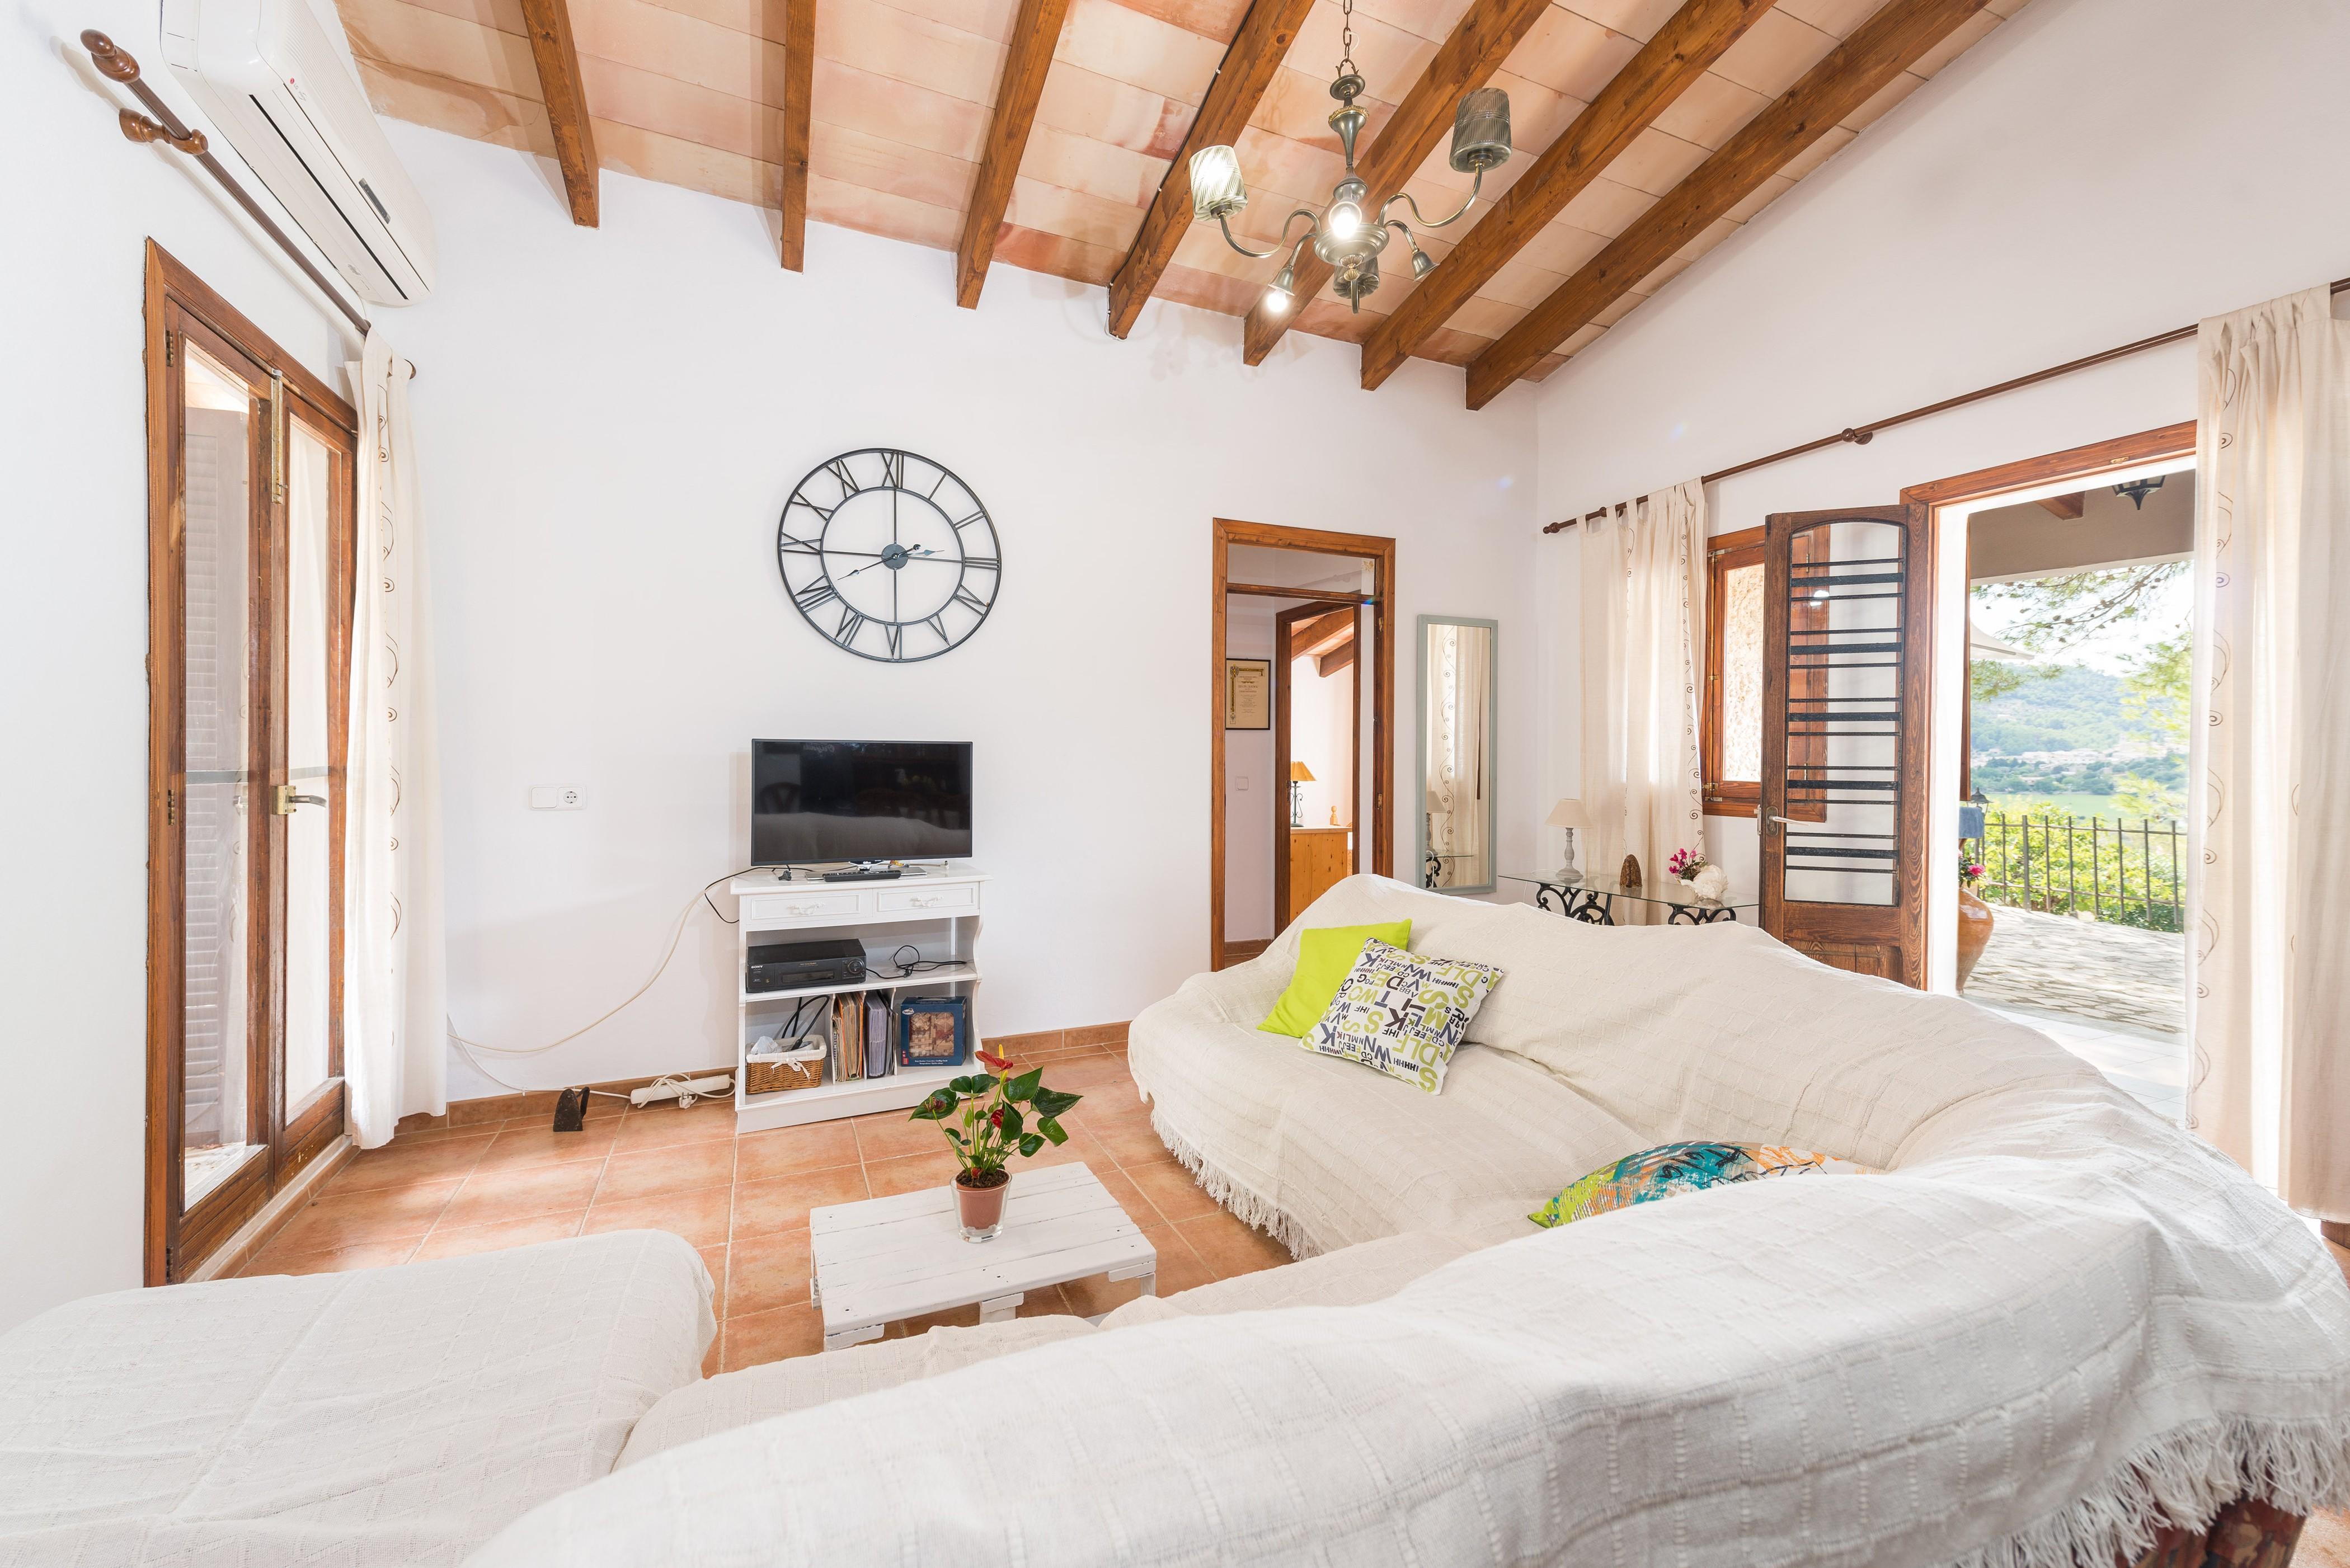 Ferienhaus SON DURINET (2302802), Mancor de la Vall, Mallorca, Balearische Inseln, Spanien, Bild 18